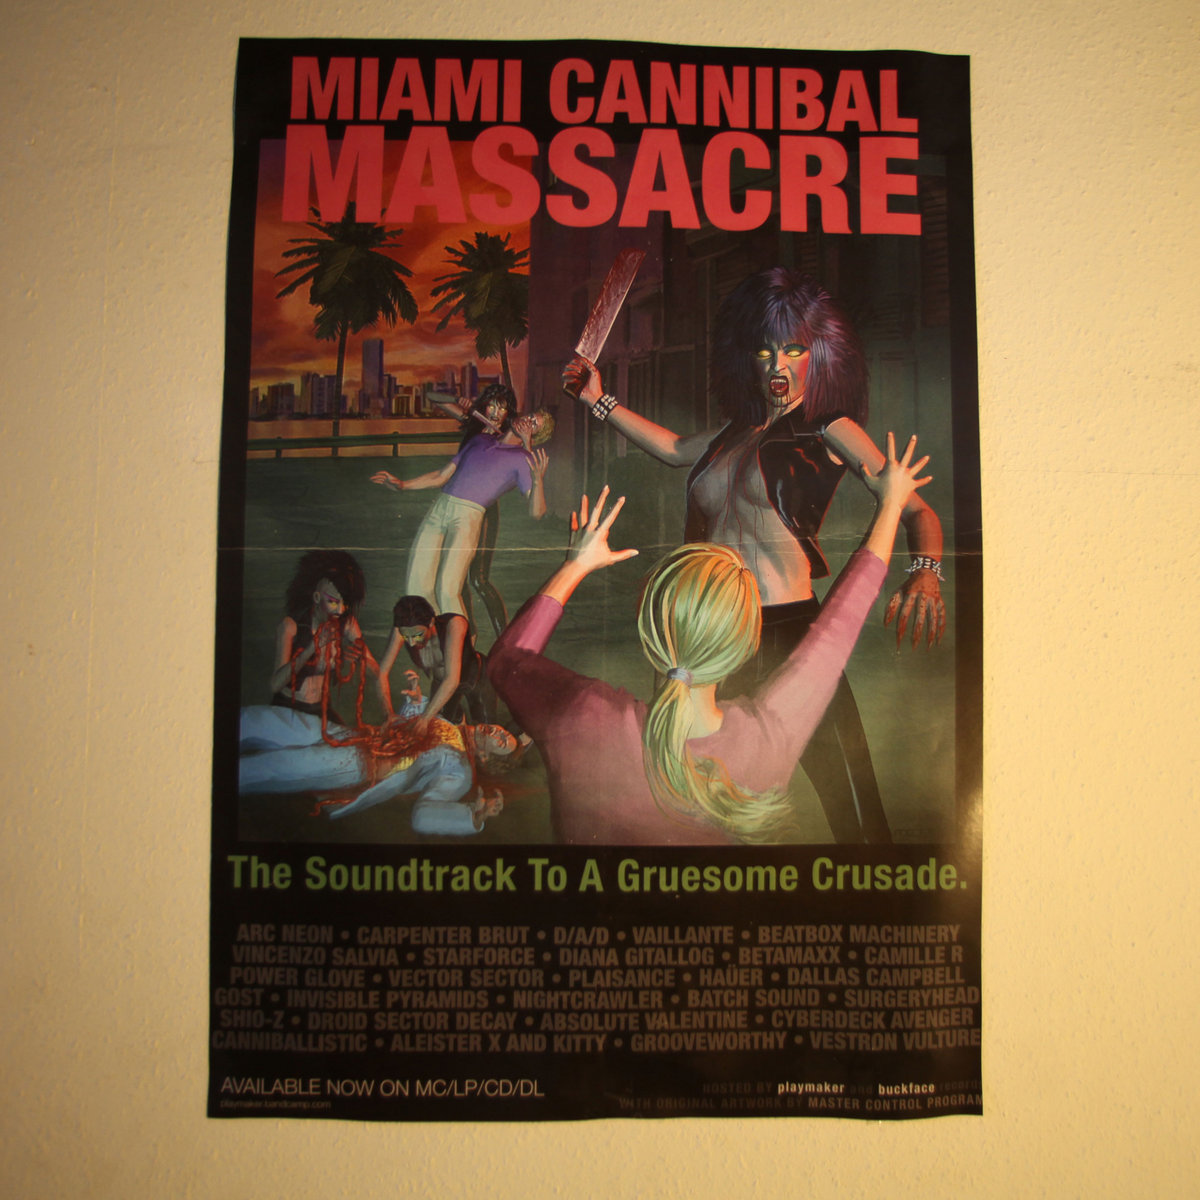 Miami Cannibal Massacre | PLAYMAKER Media Group